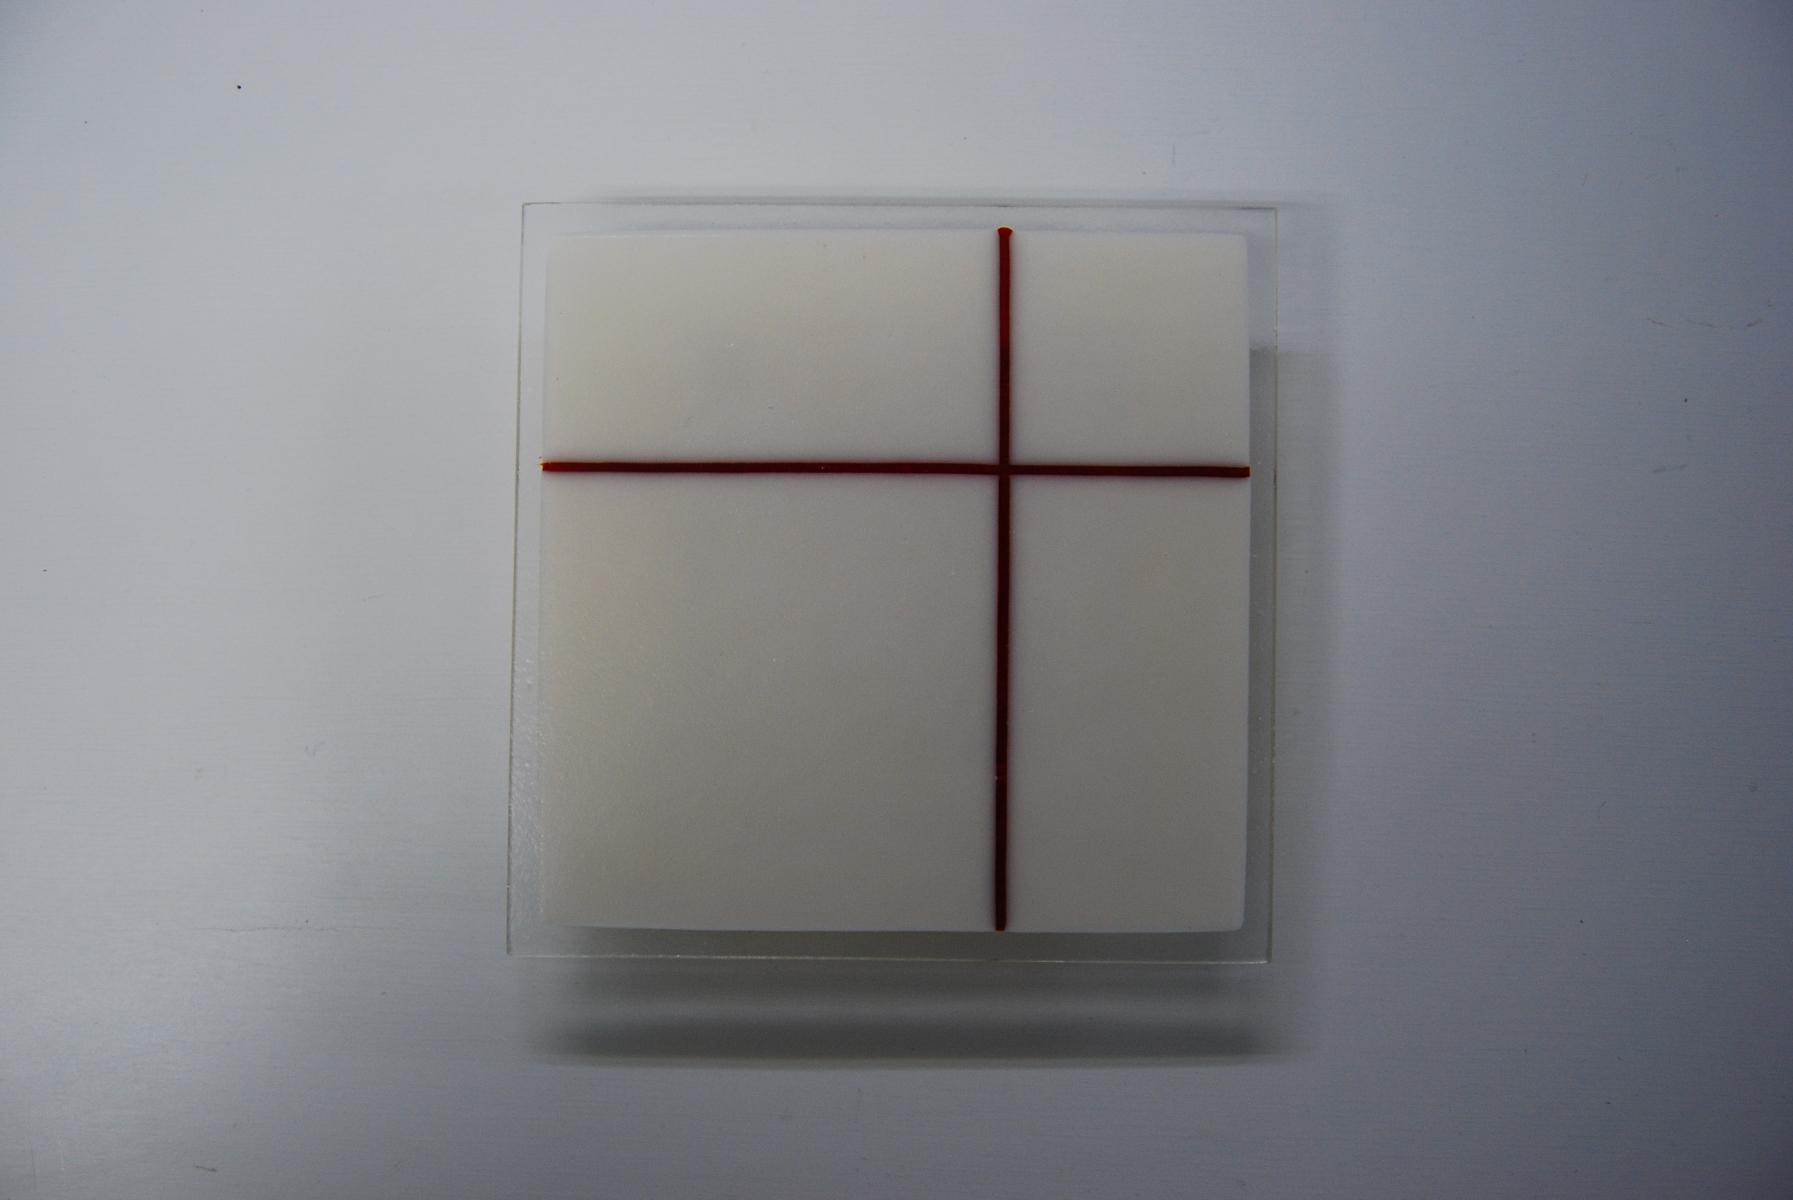 20111214 036